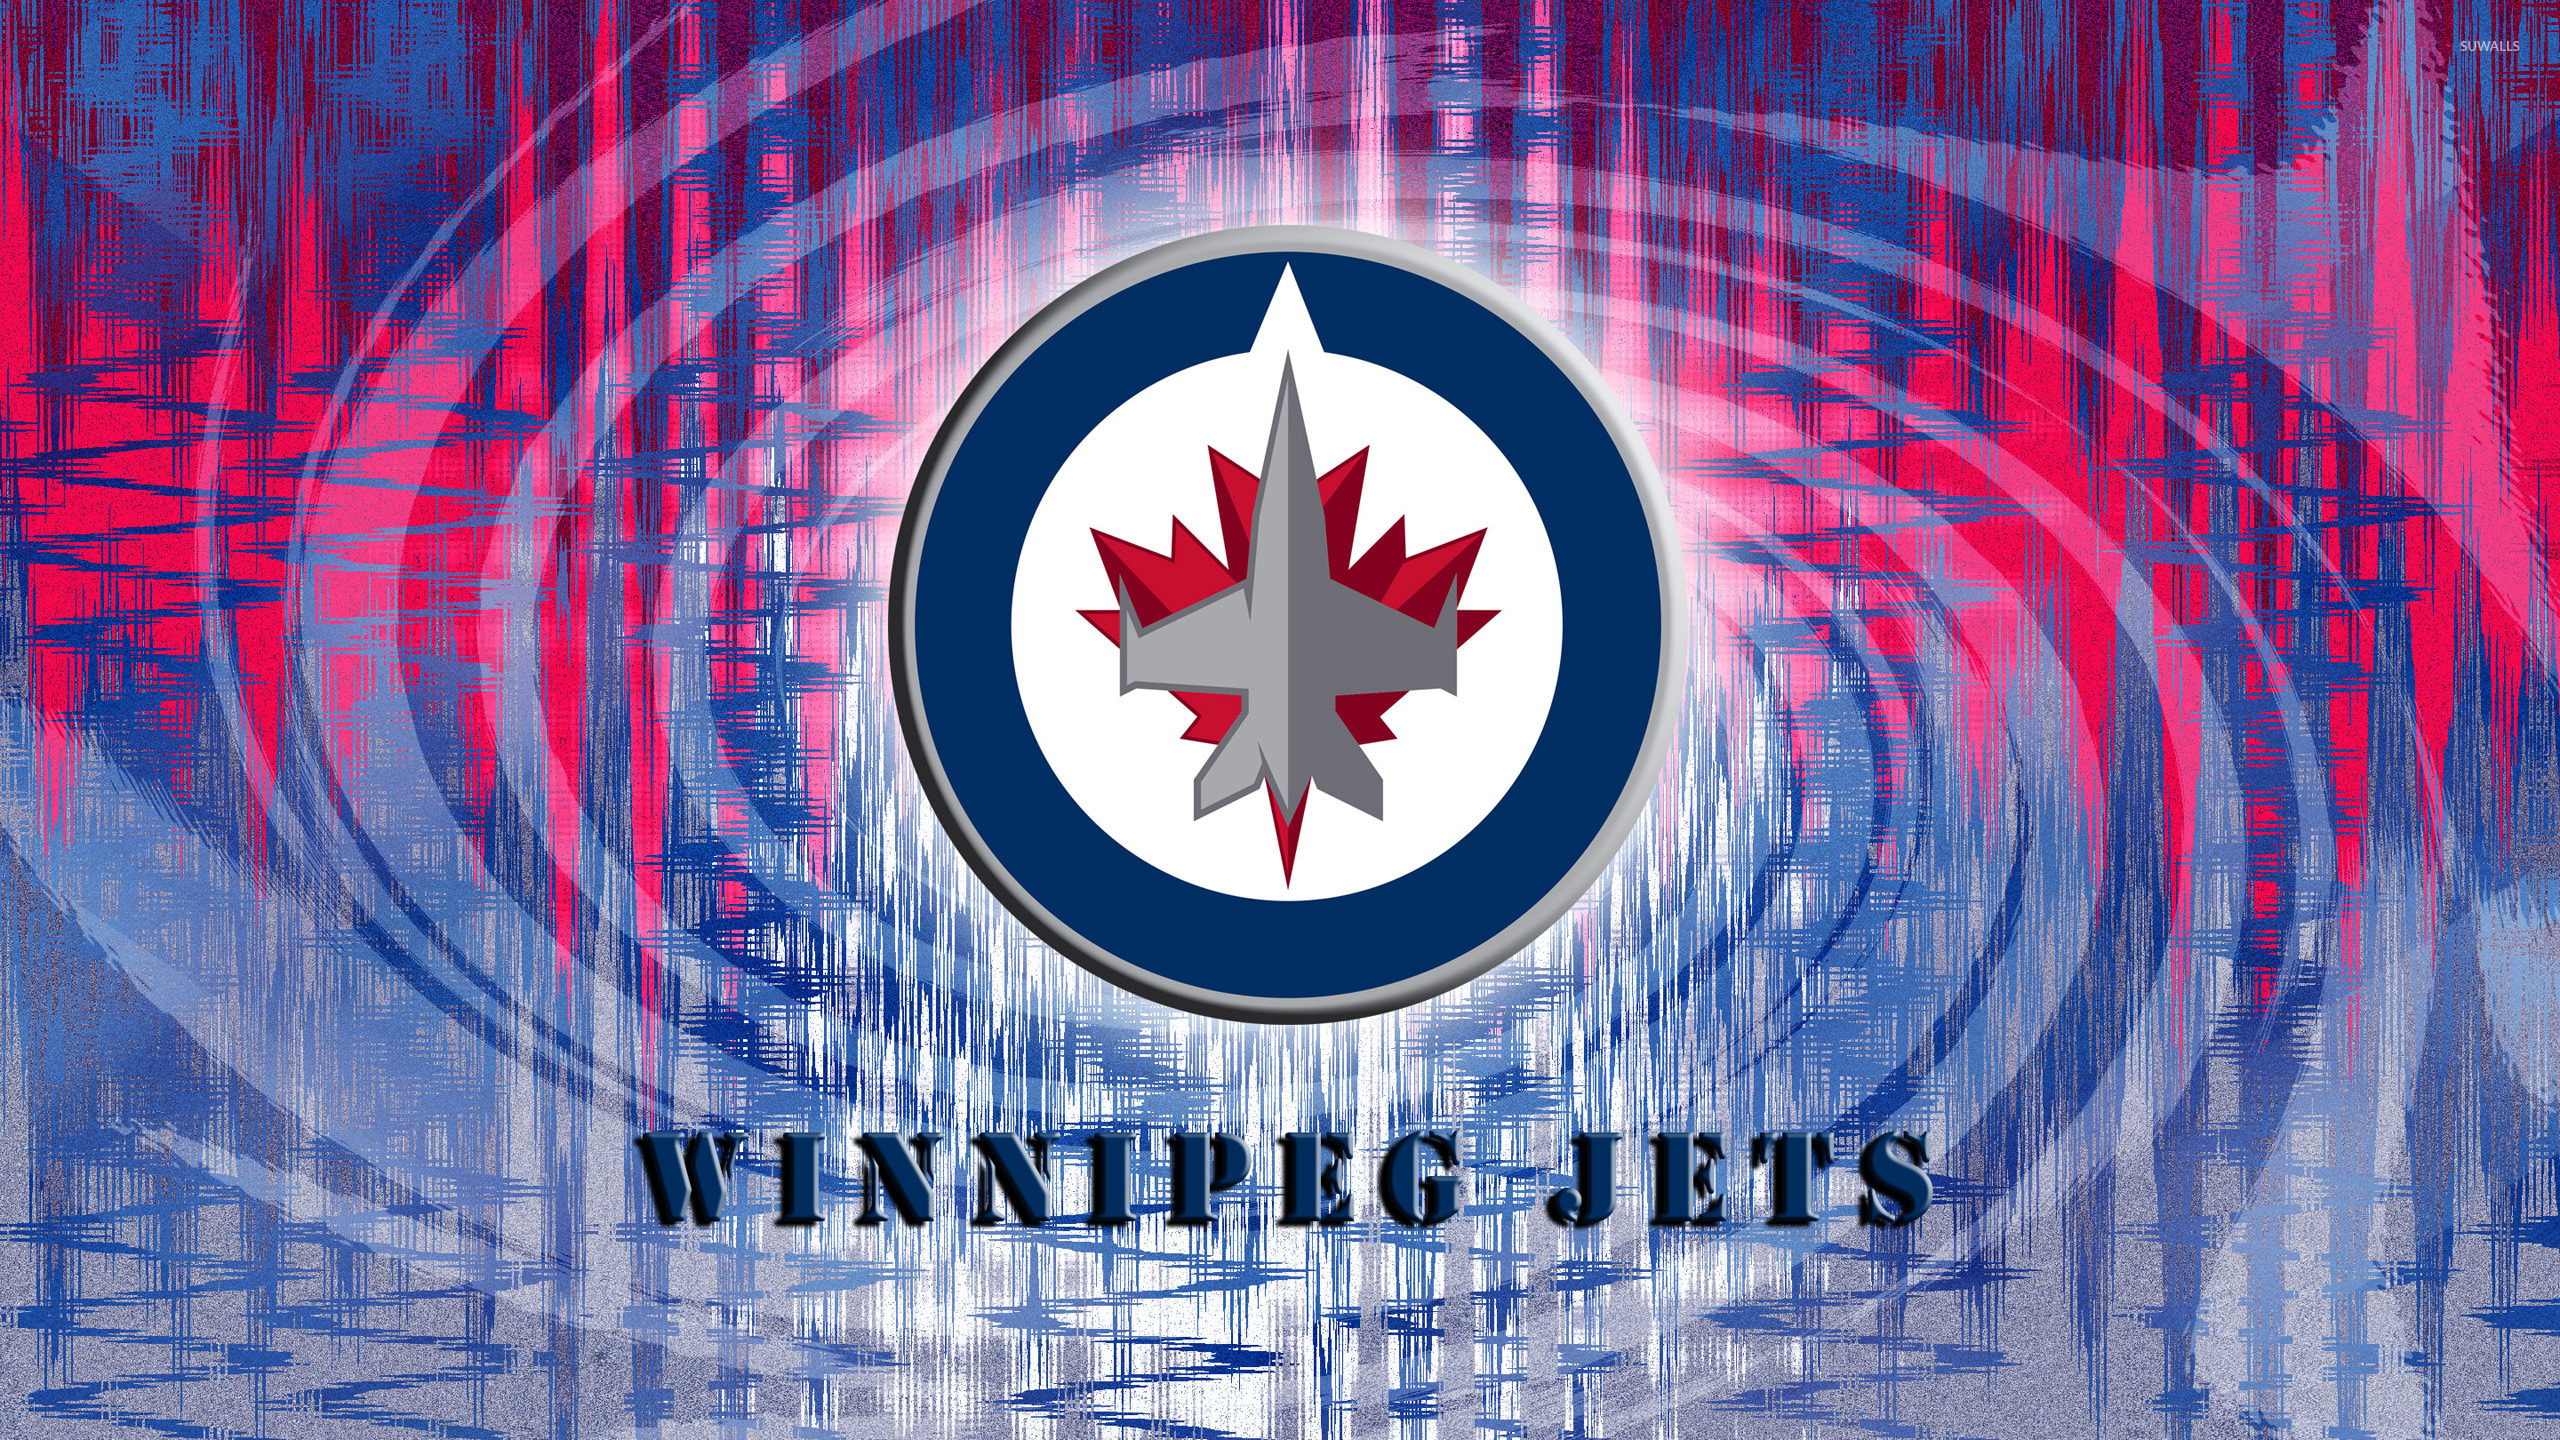 Winnipeg Jets Wallpaper Sport Wallpapers 19508